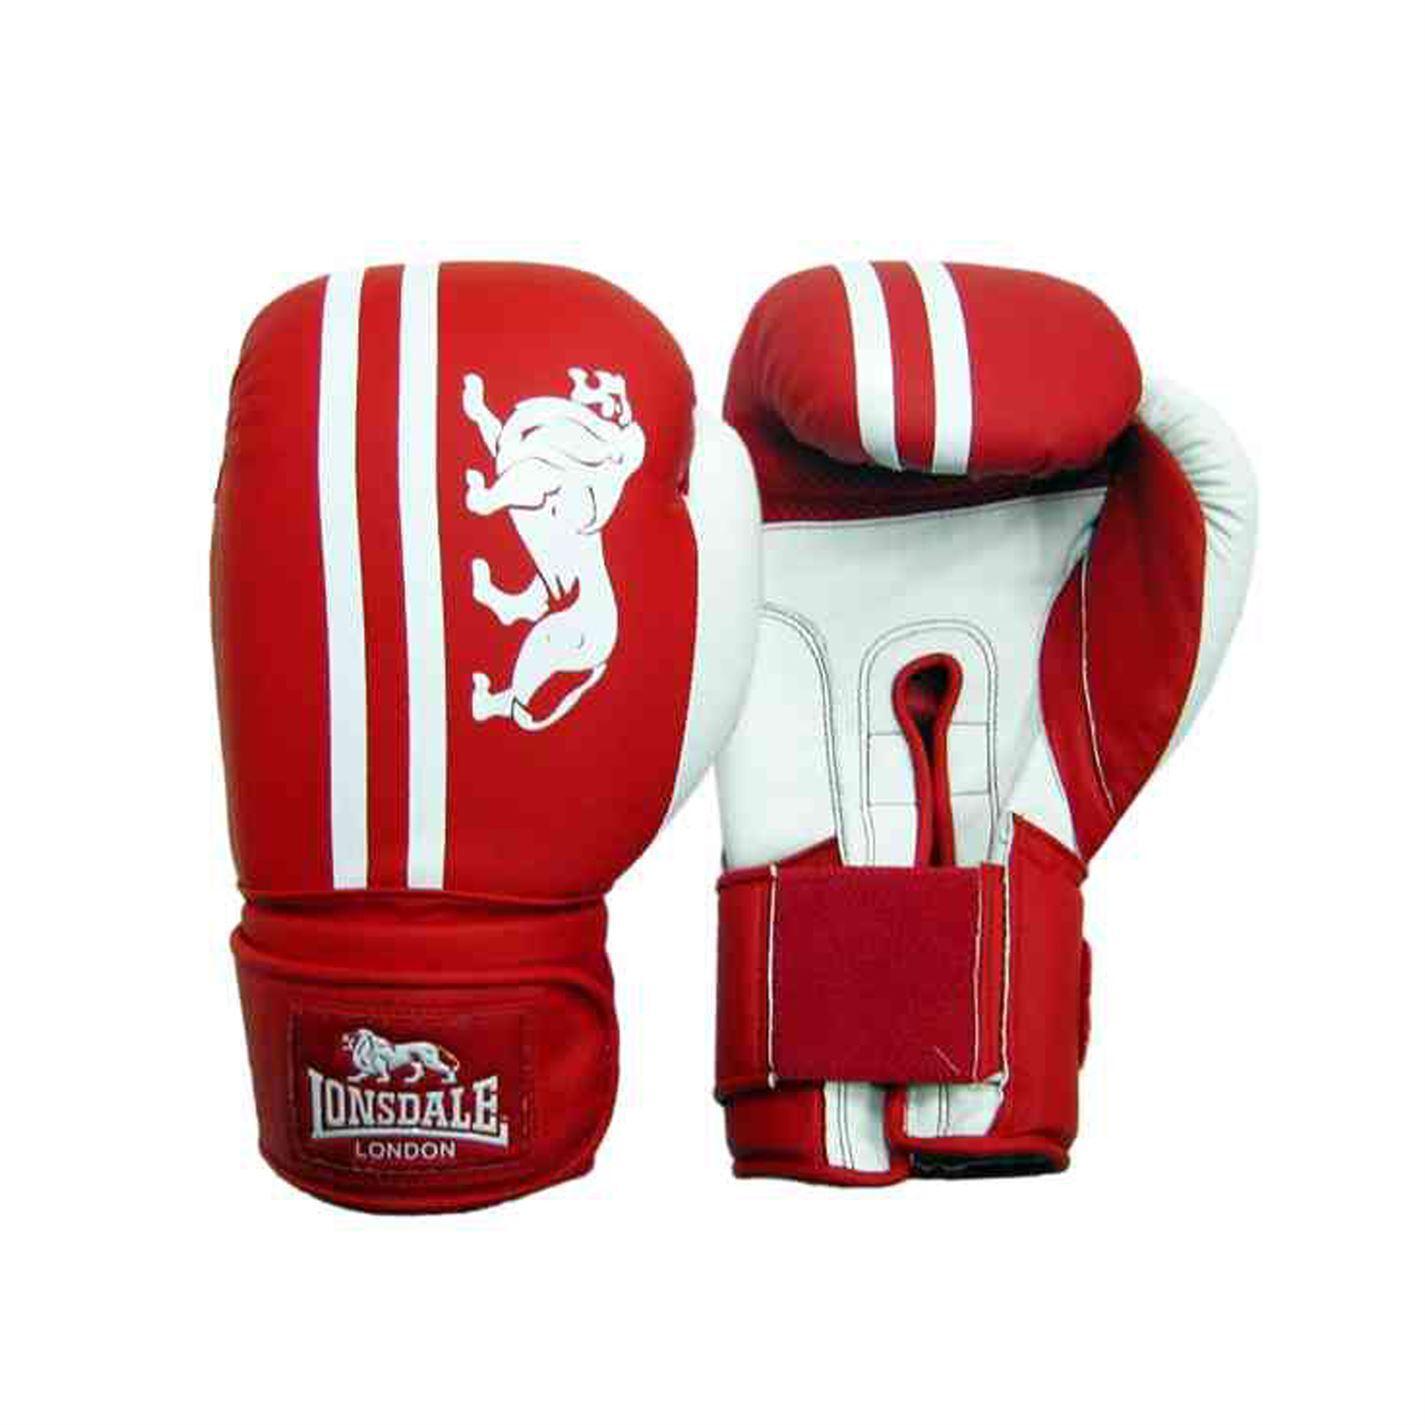 Lonsdale Club Sparring Guanti Da Boxe Rosso/Bianco Guanti allenamento palestra